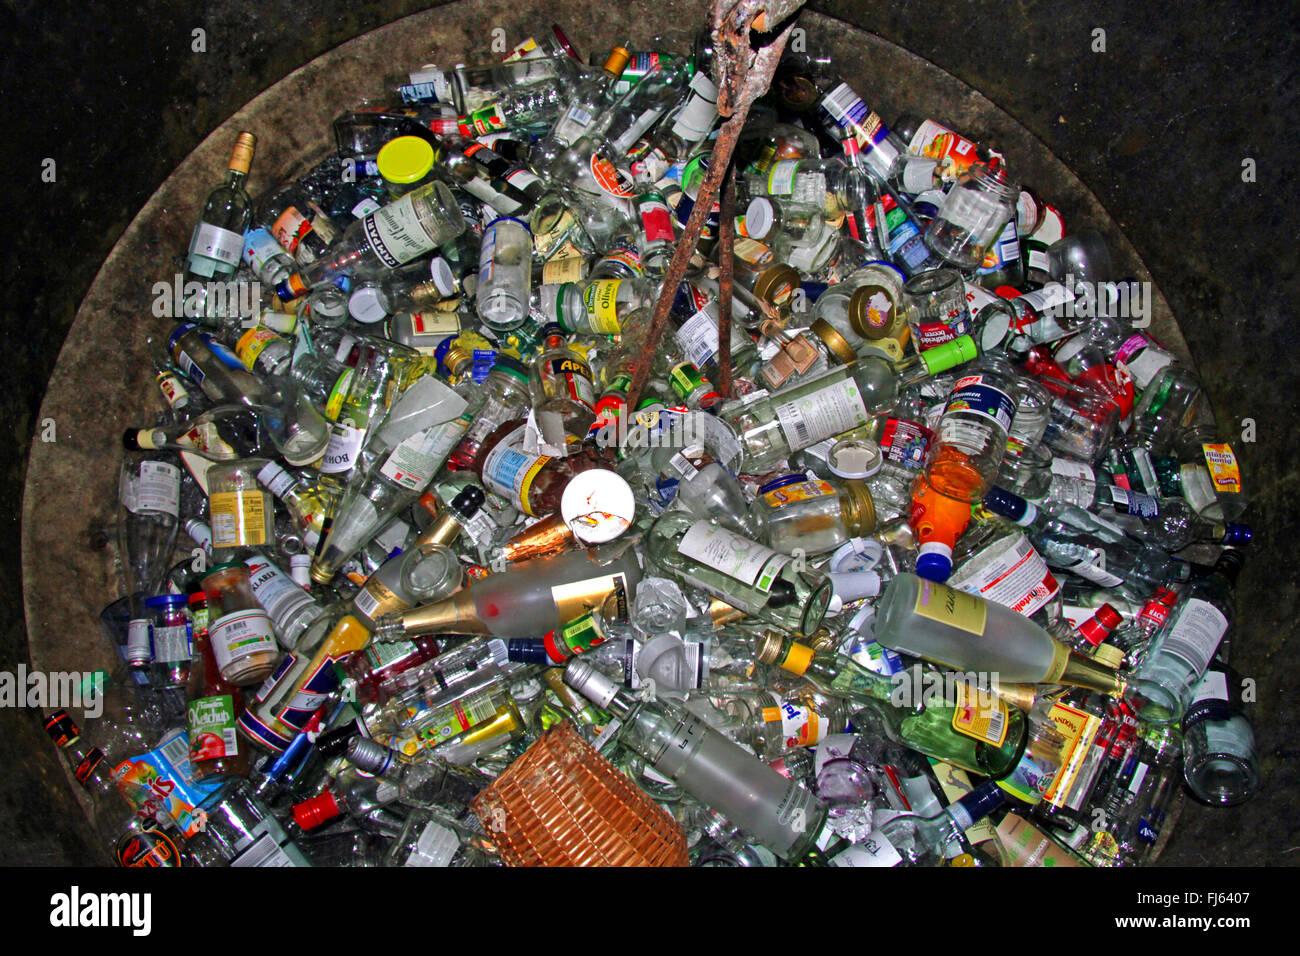 inside of a bottle bank, Germany - Stock Image